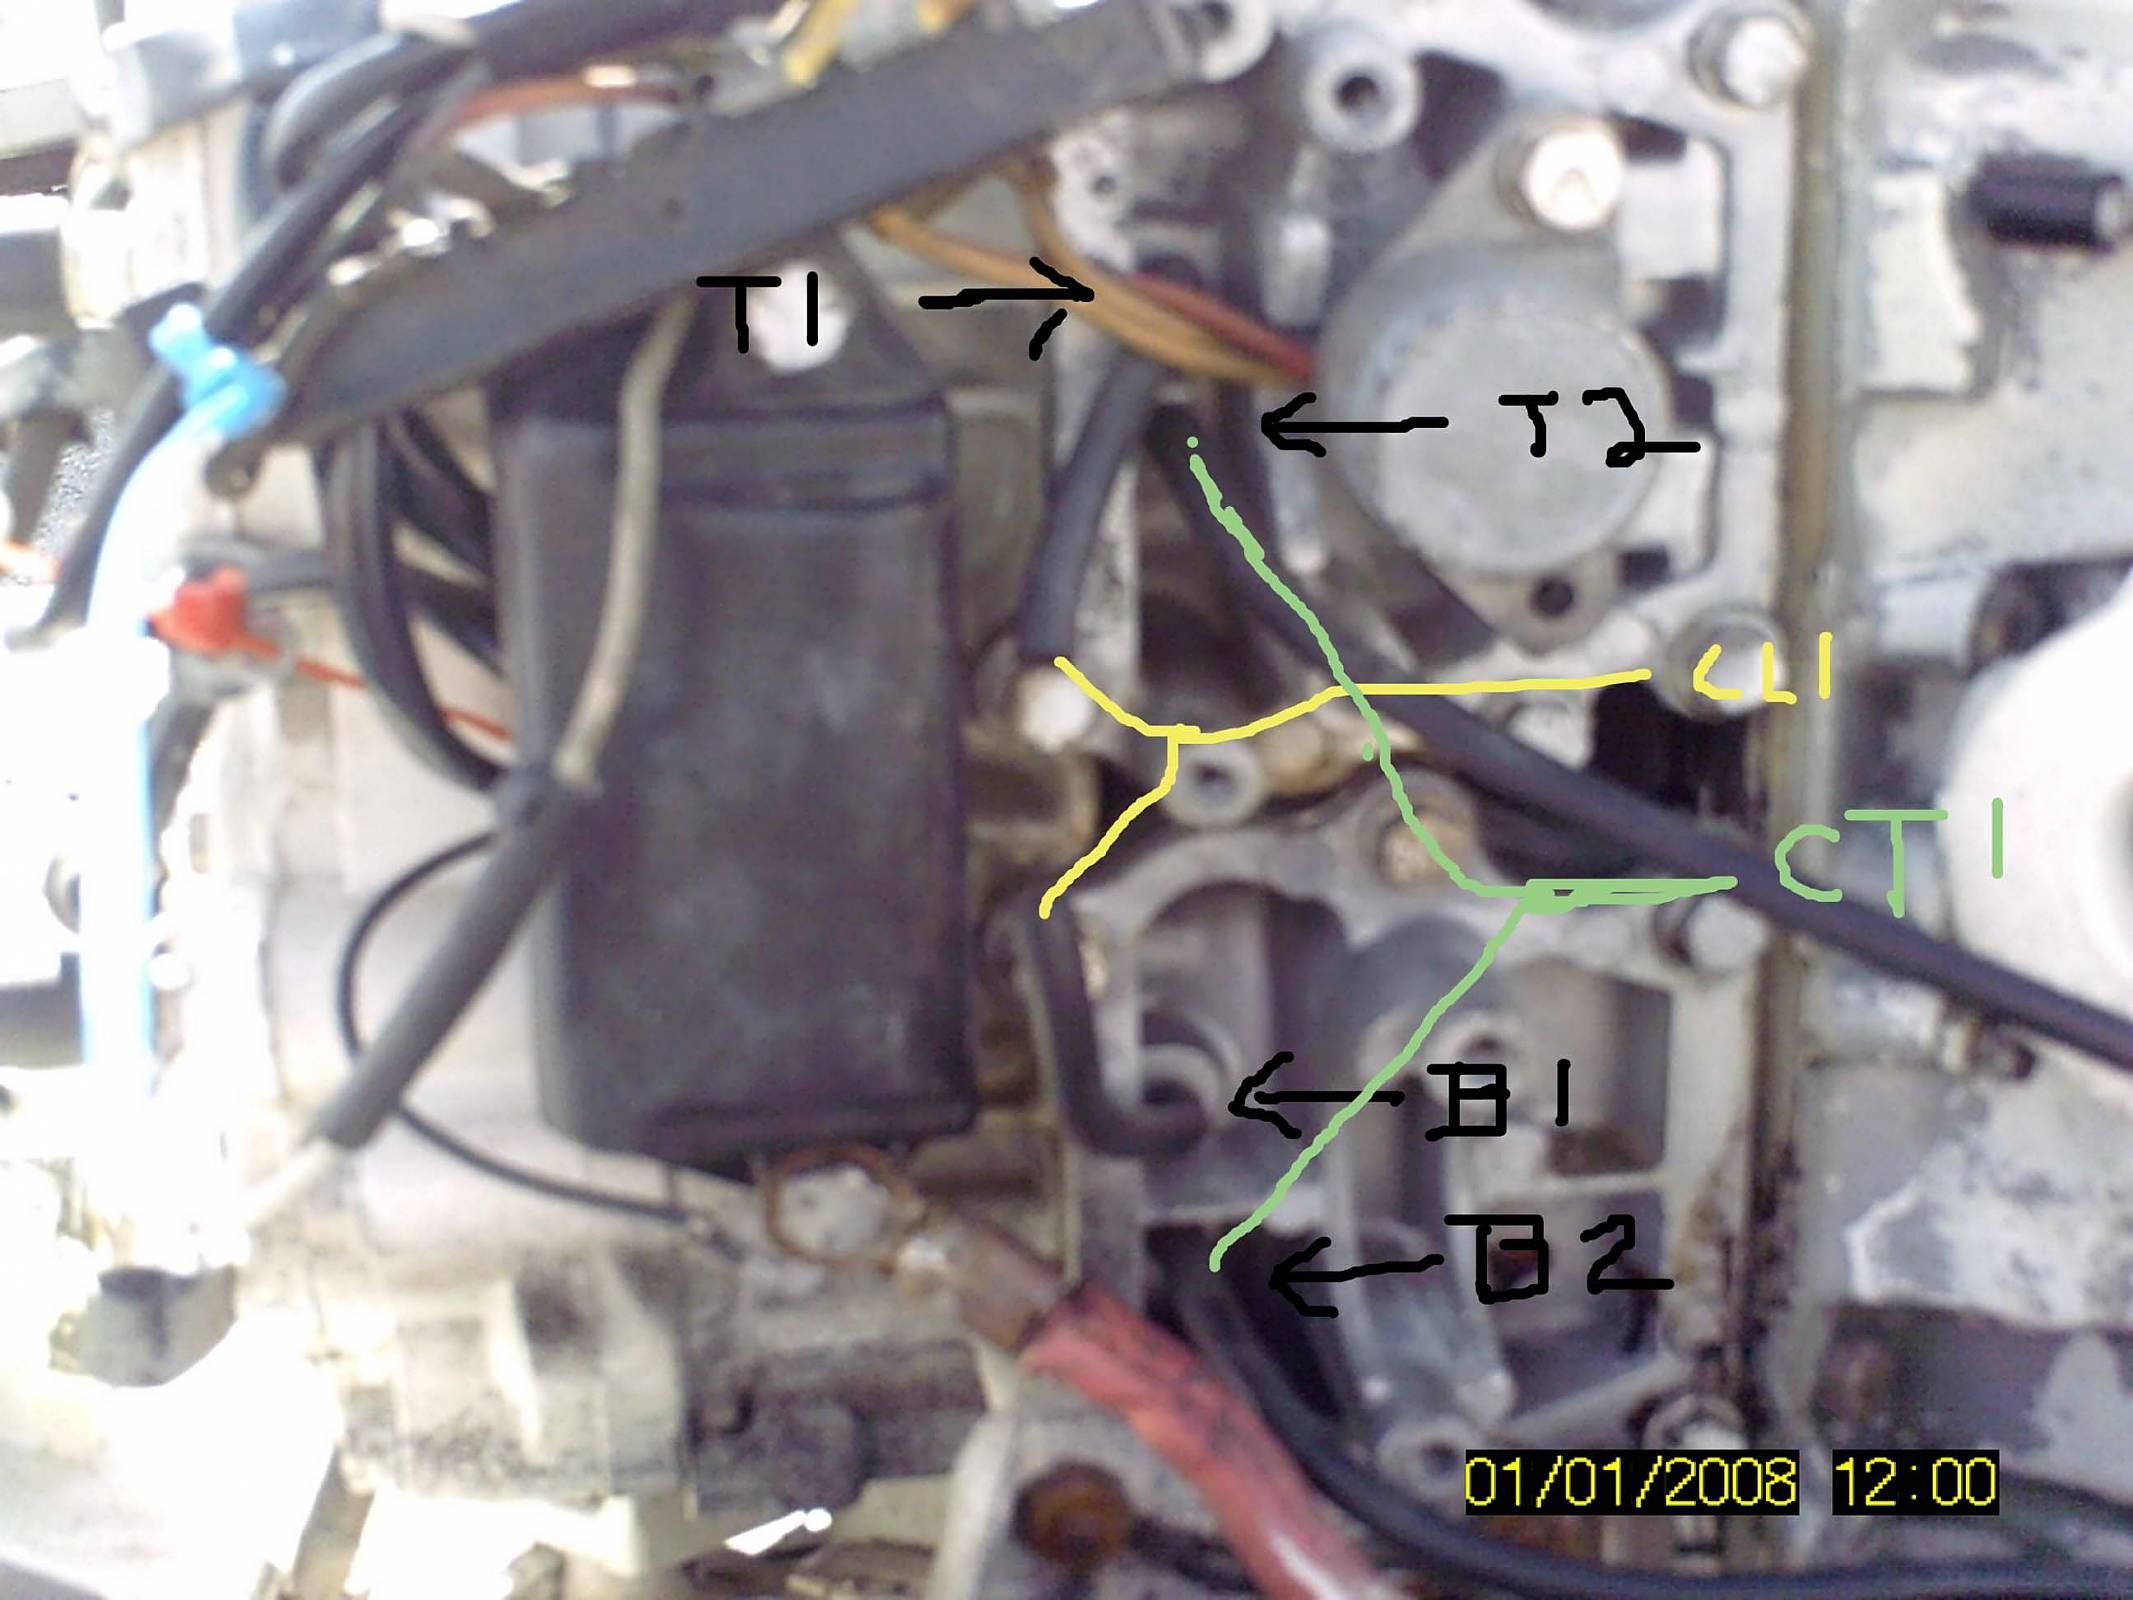 evinrude etec 115 wiring diagram for windshield wiper motor 1999 johnson 90 hp outboard impremedia